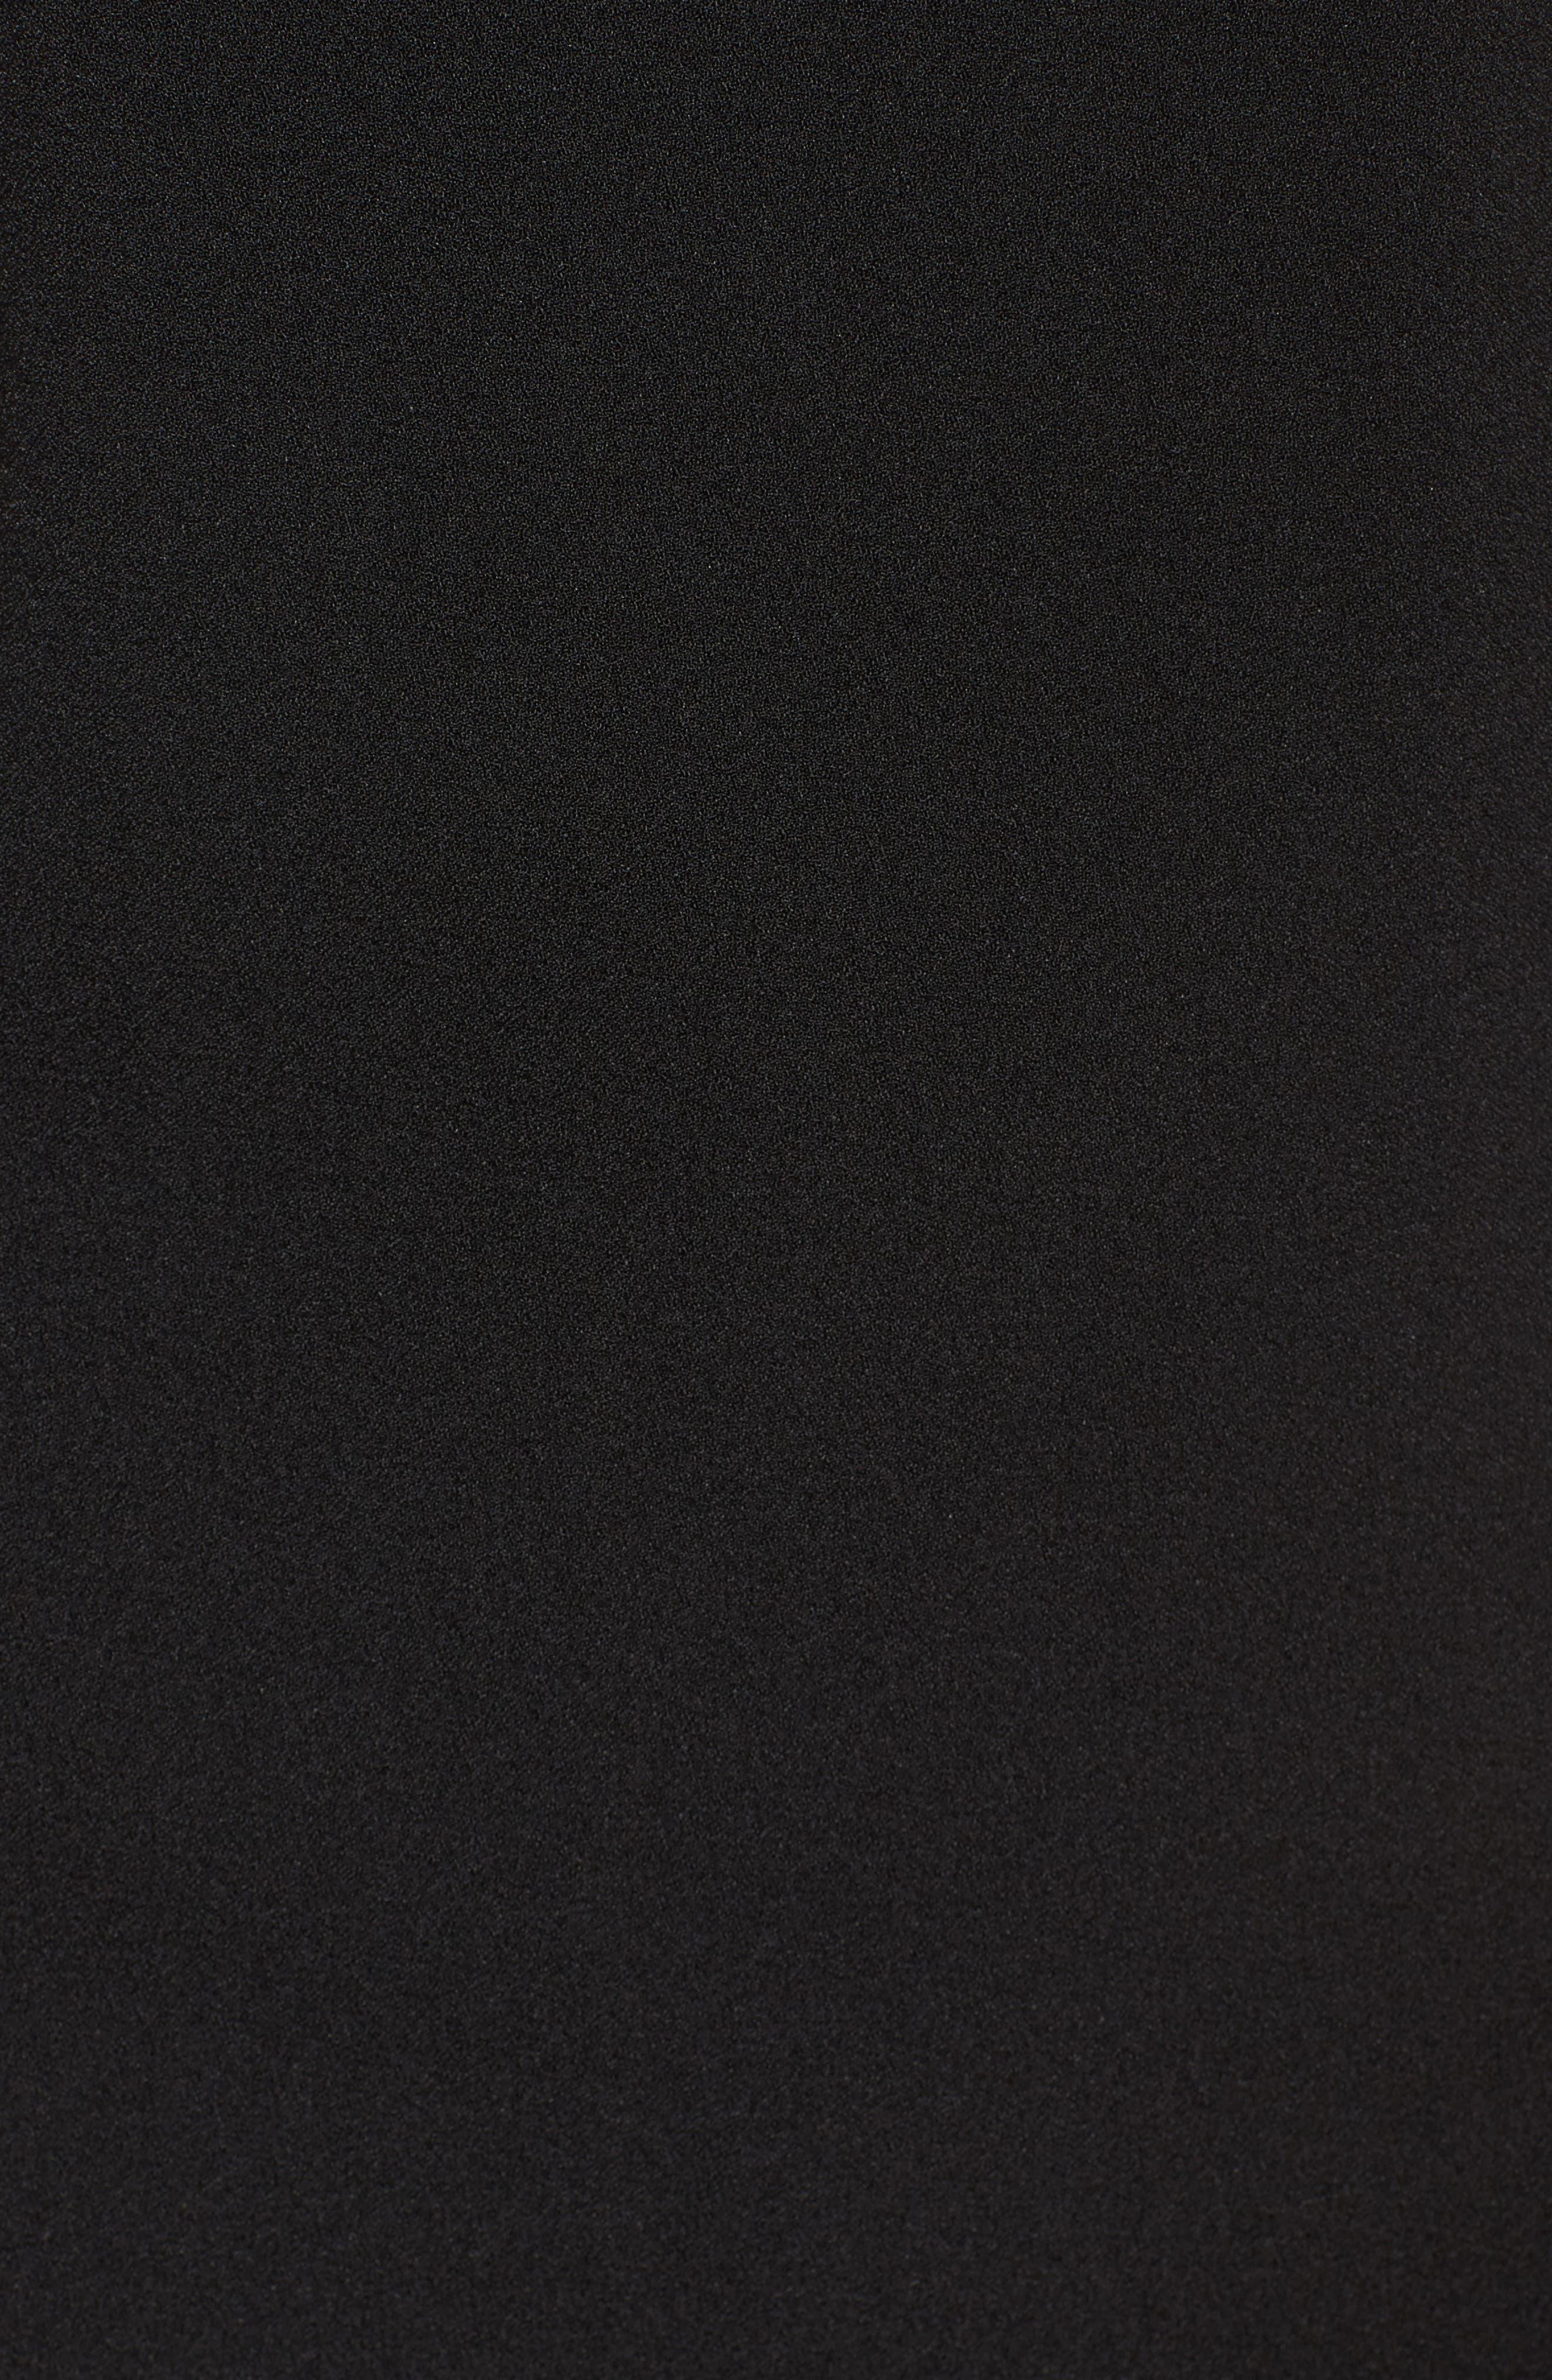 Lace Ruffle Sheath Dress,                             Alternate thumbnail 5, color,                             Black